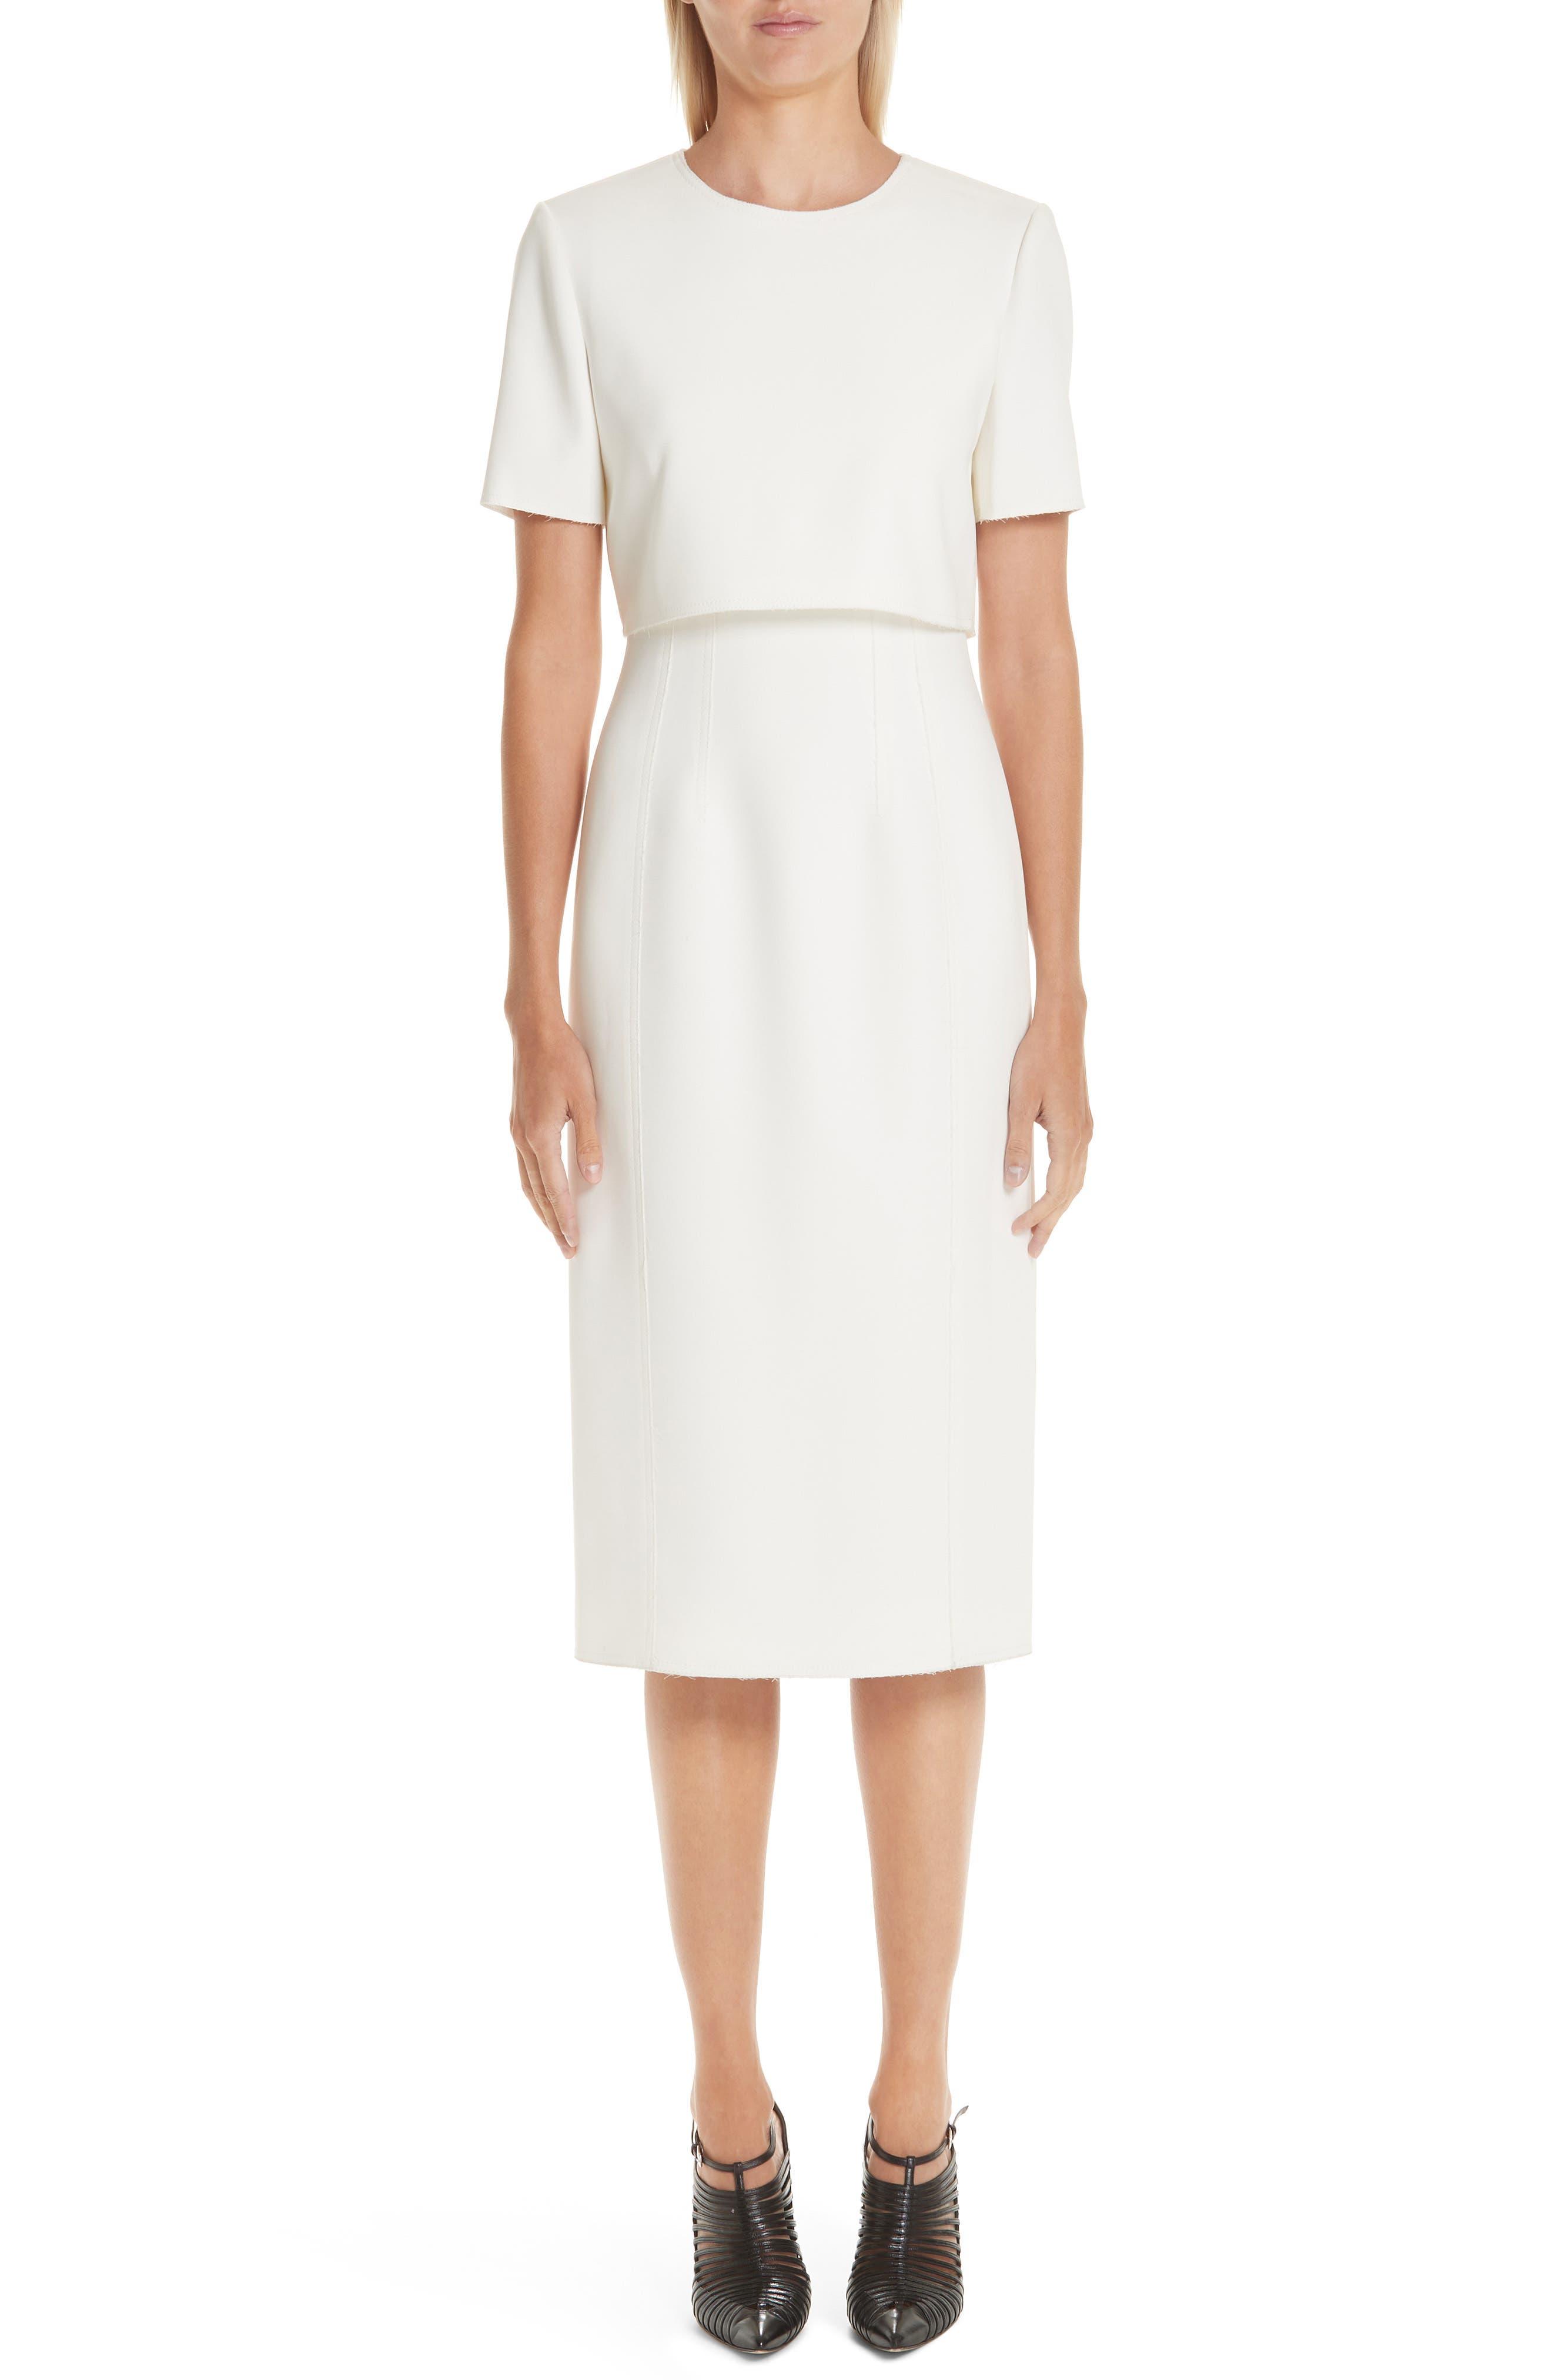 Jason Wu Collection Popover Compact Crepe Sheath Dress, White